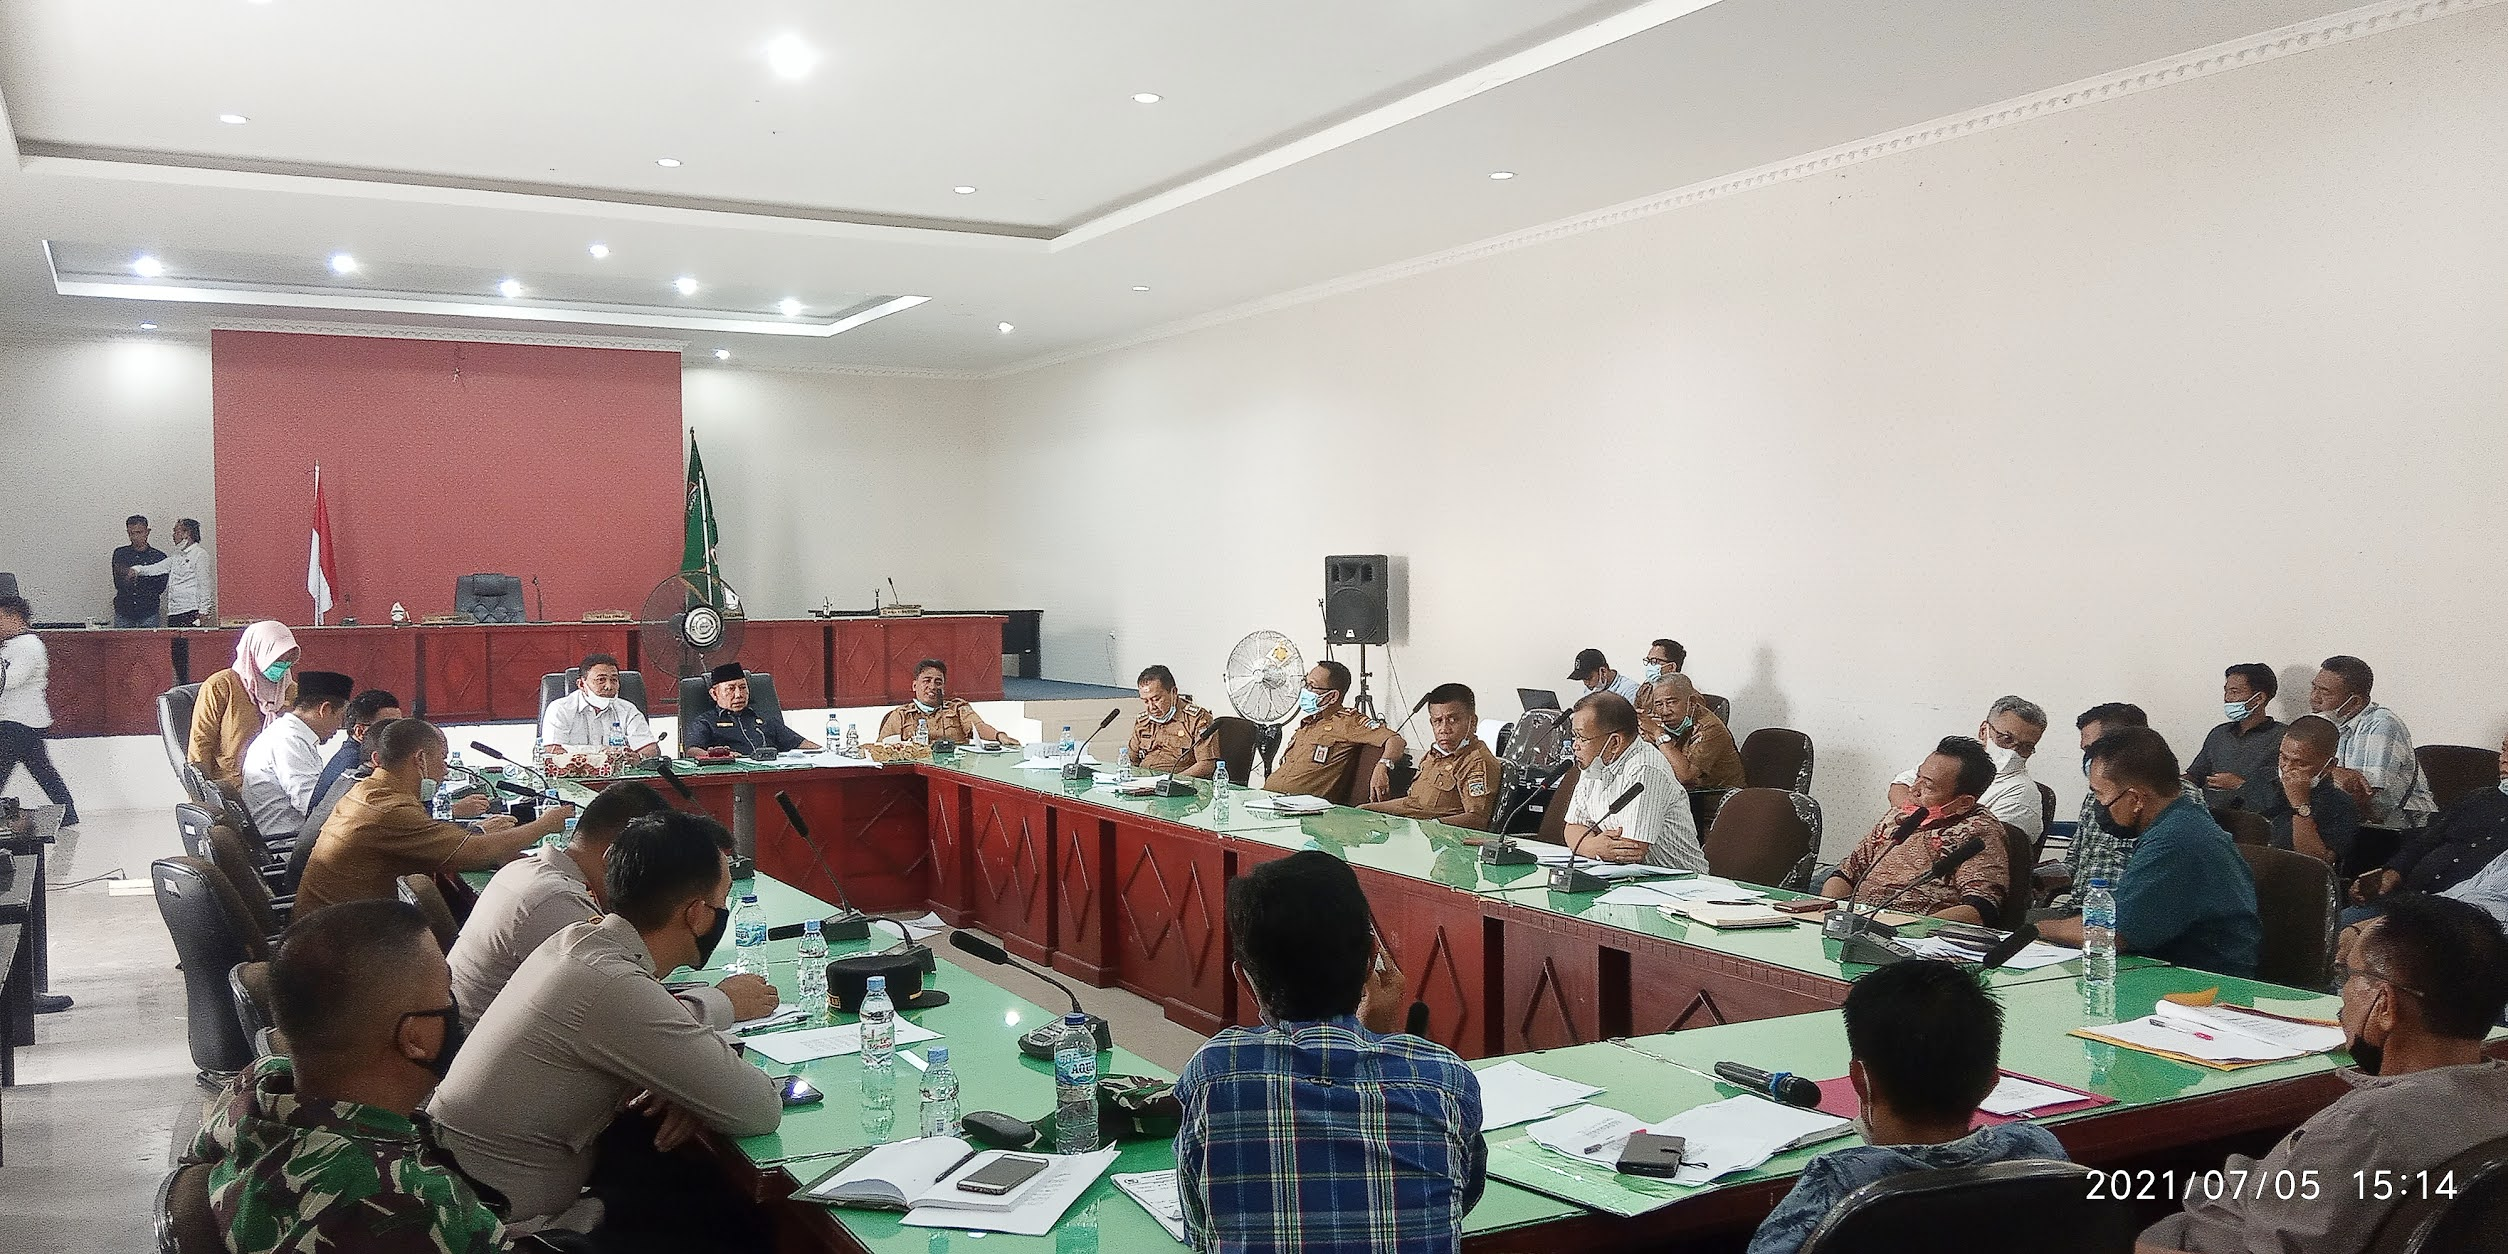 Rapat gabungan DPRD terkait konflik antara masyarakat Desa Beringin Makmur 1 dengan pihak PT London Sumatera Indonesia Tbk (PT. Lonsum)